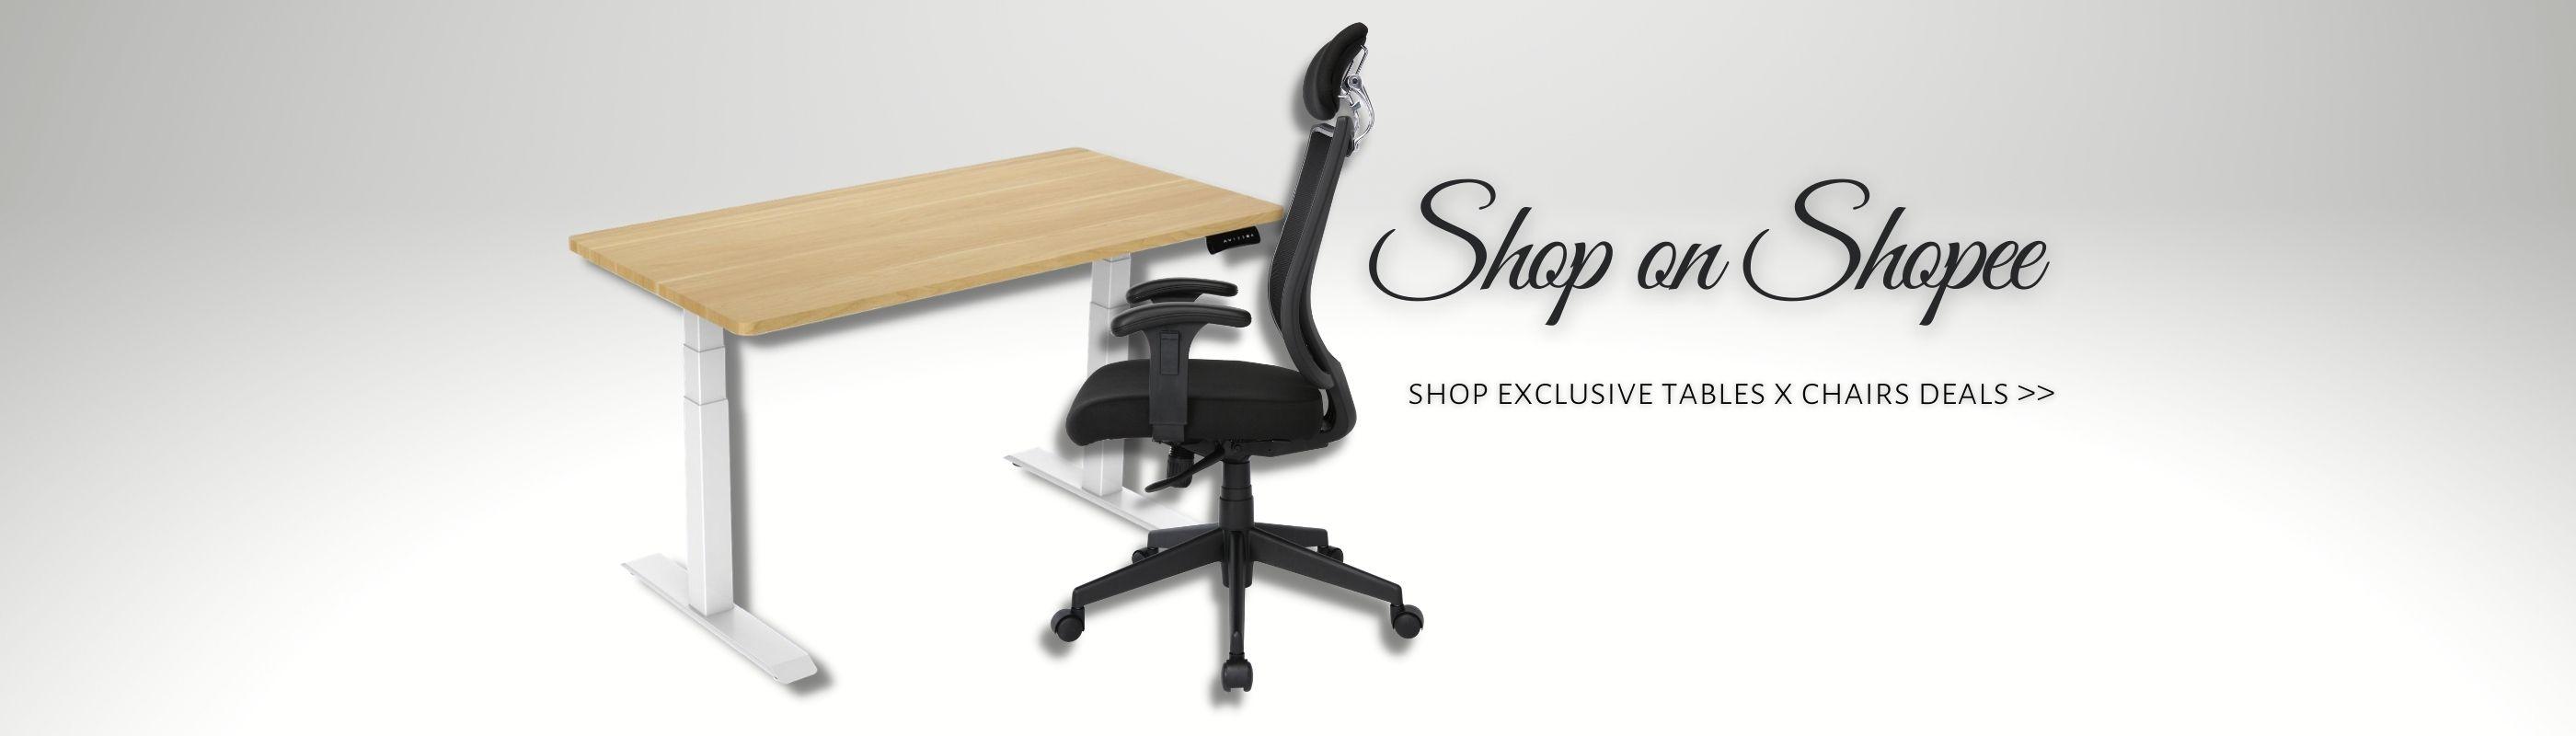 Height Adjustable Table_OfficeChair_Shopee_Offitek